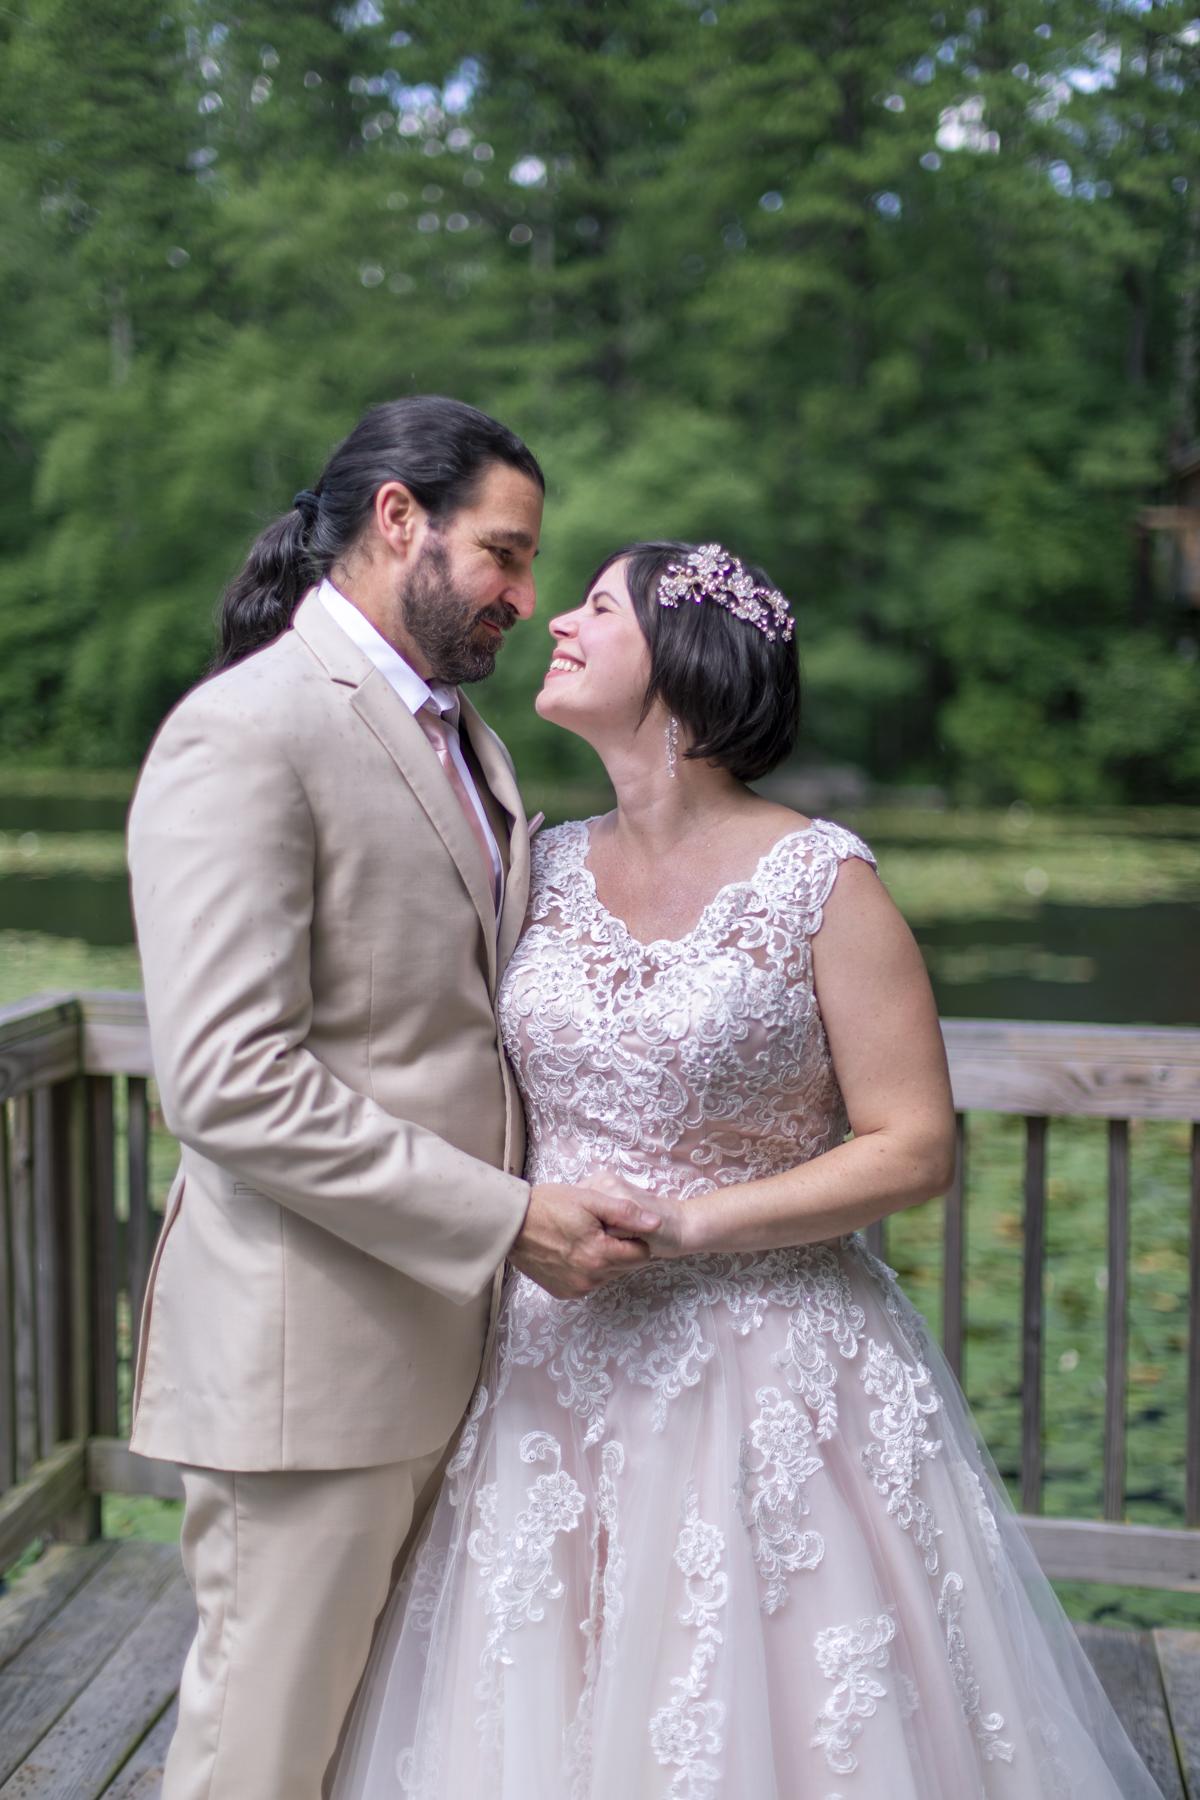 Avyanna and Phoenix Wedding 2019_photos by Studio Misha_BLOG-60.jpg